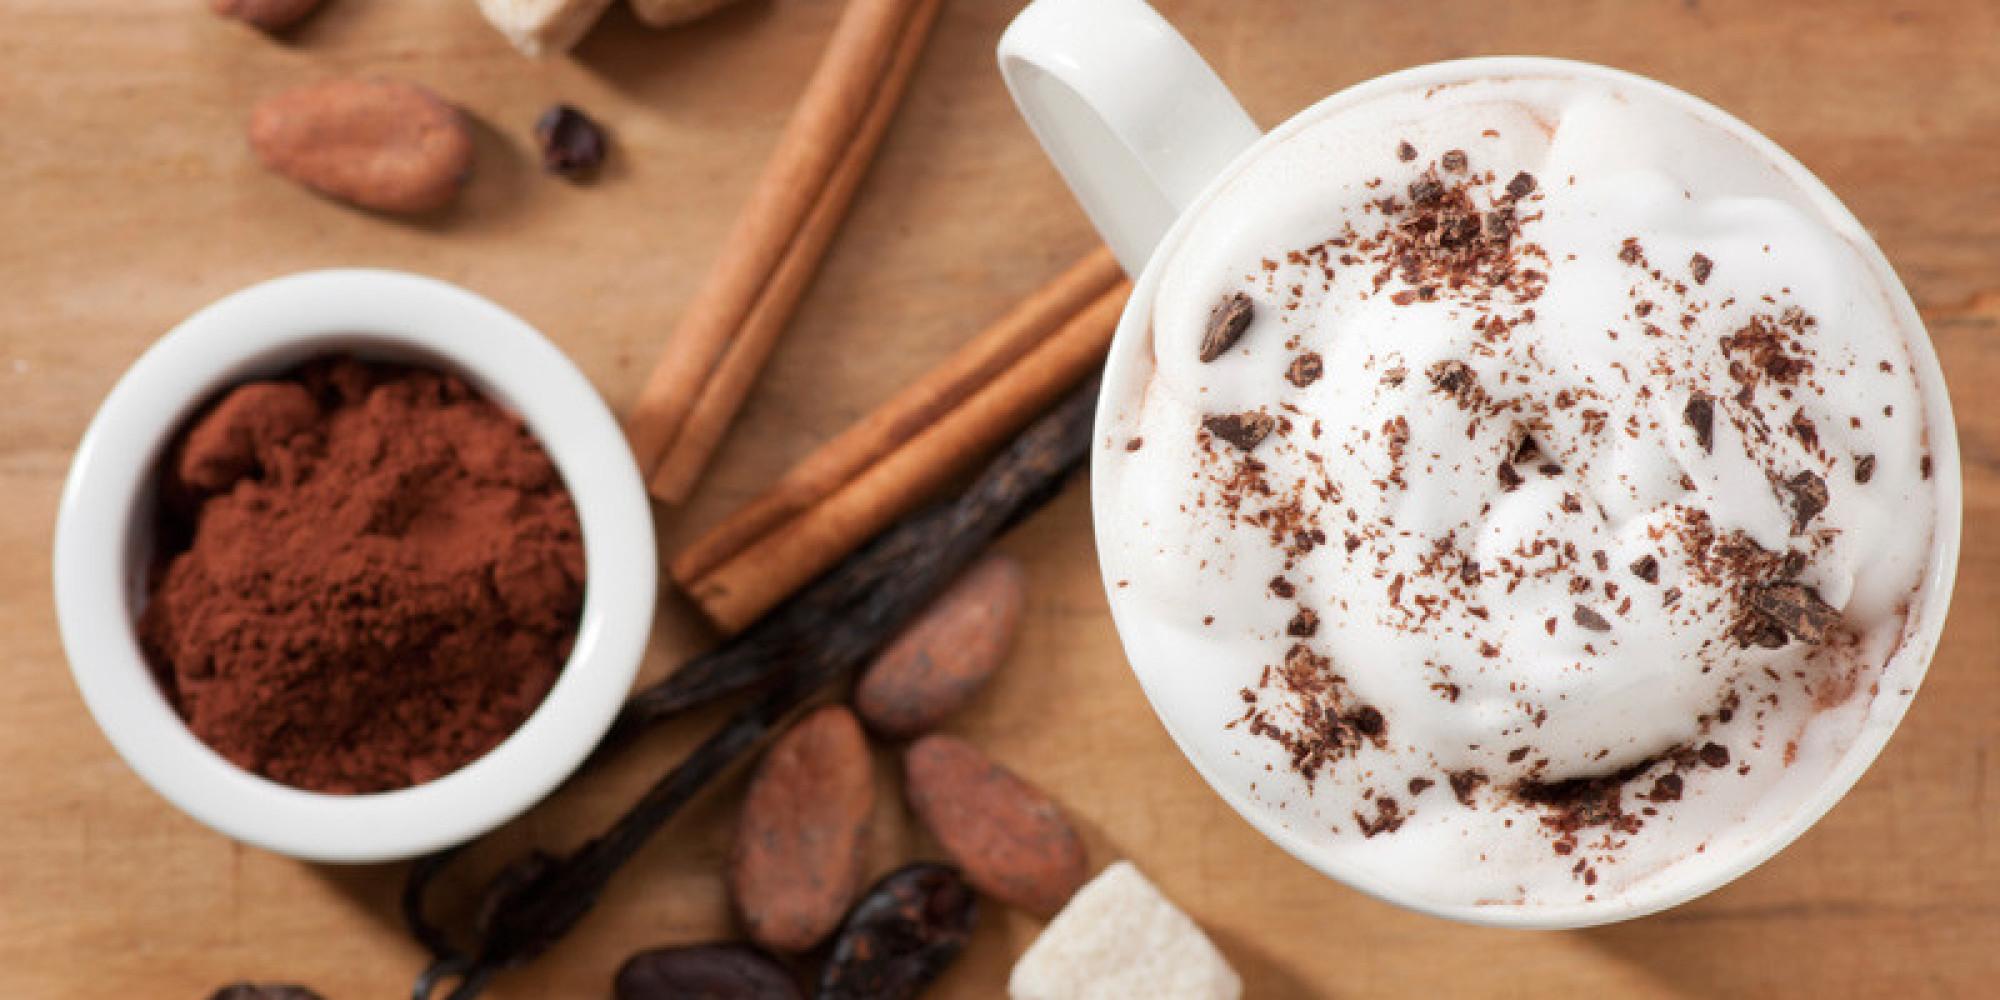 Health Benefits of Chocolate - Improve Brain Function & Heart Health